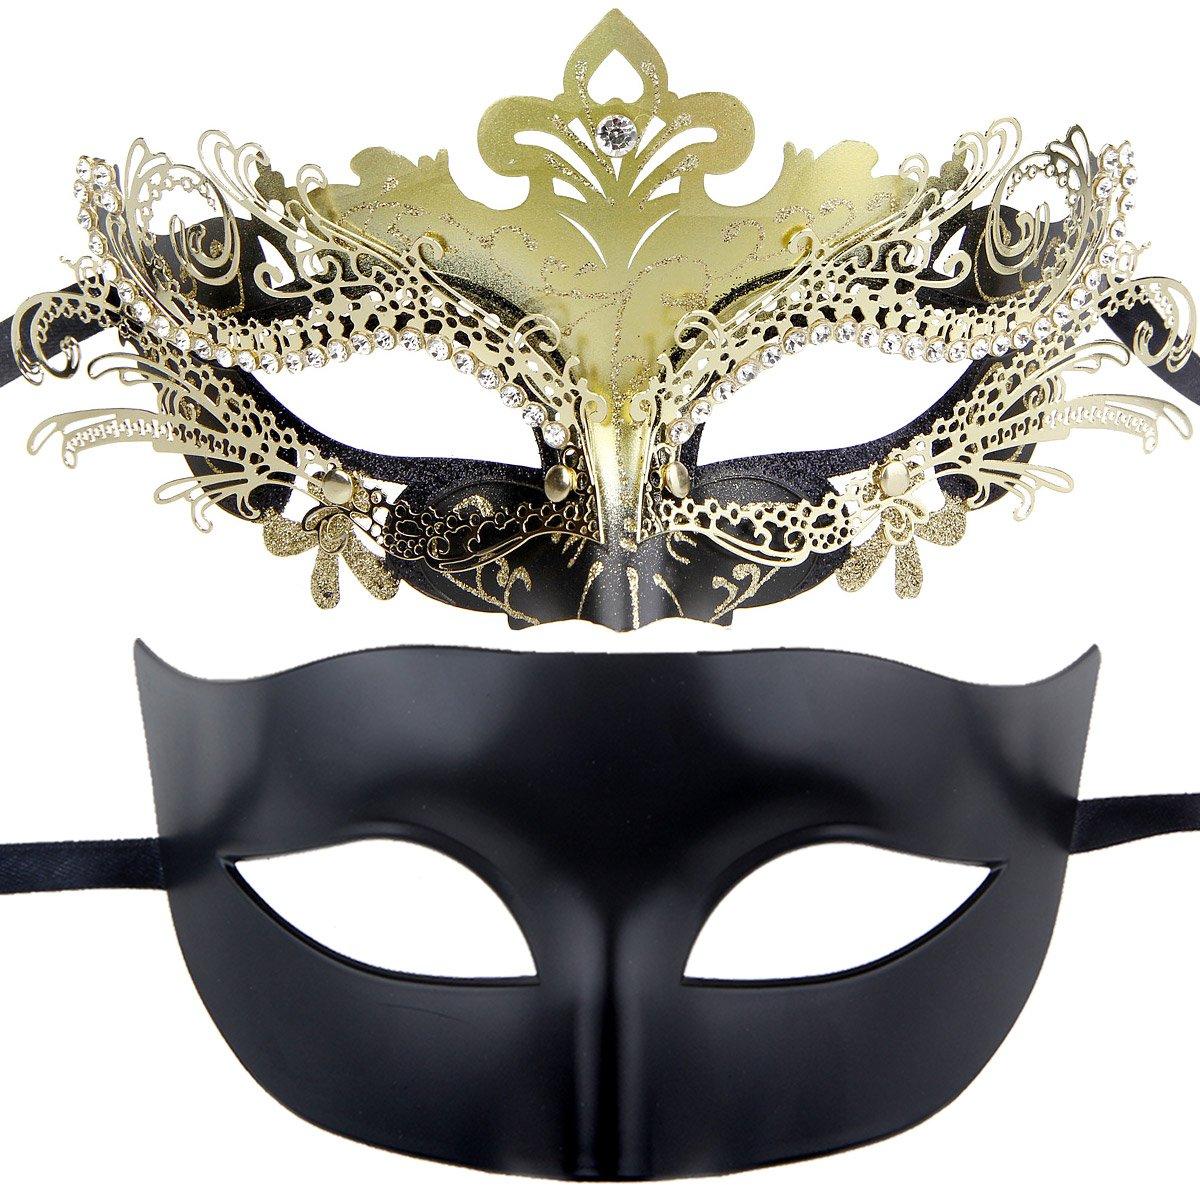 IETANG Couples Pair Half Venetian Masquerade Ball Mask Set Party Costume Accessory (Gold&Black)